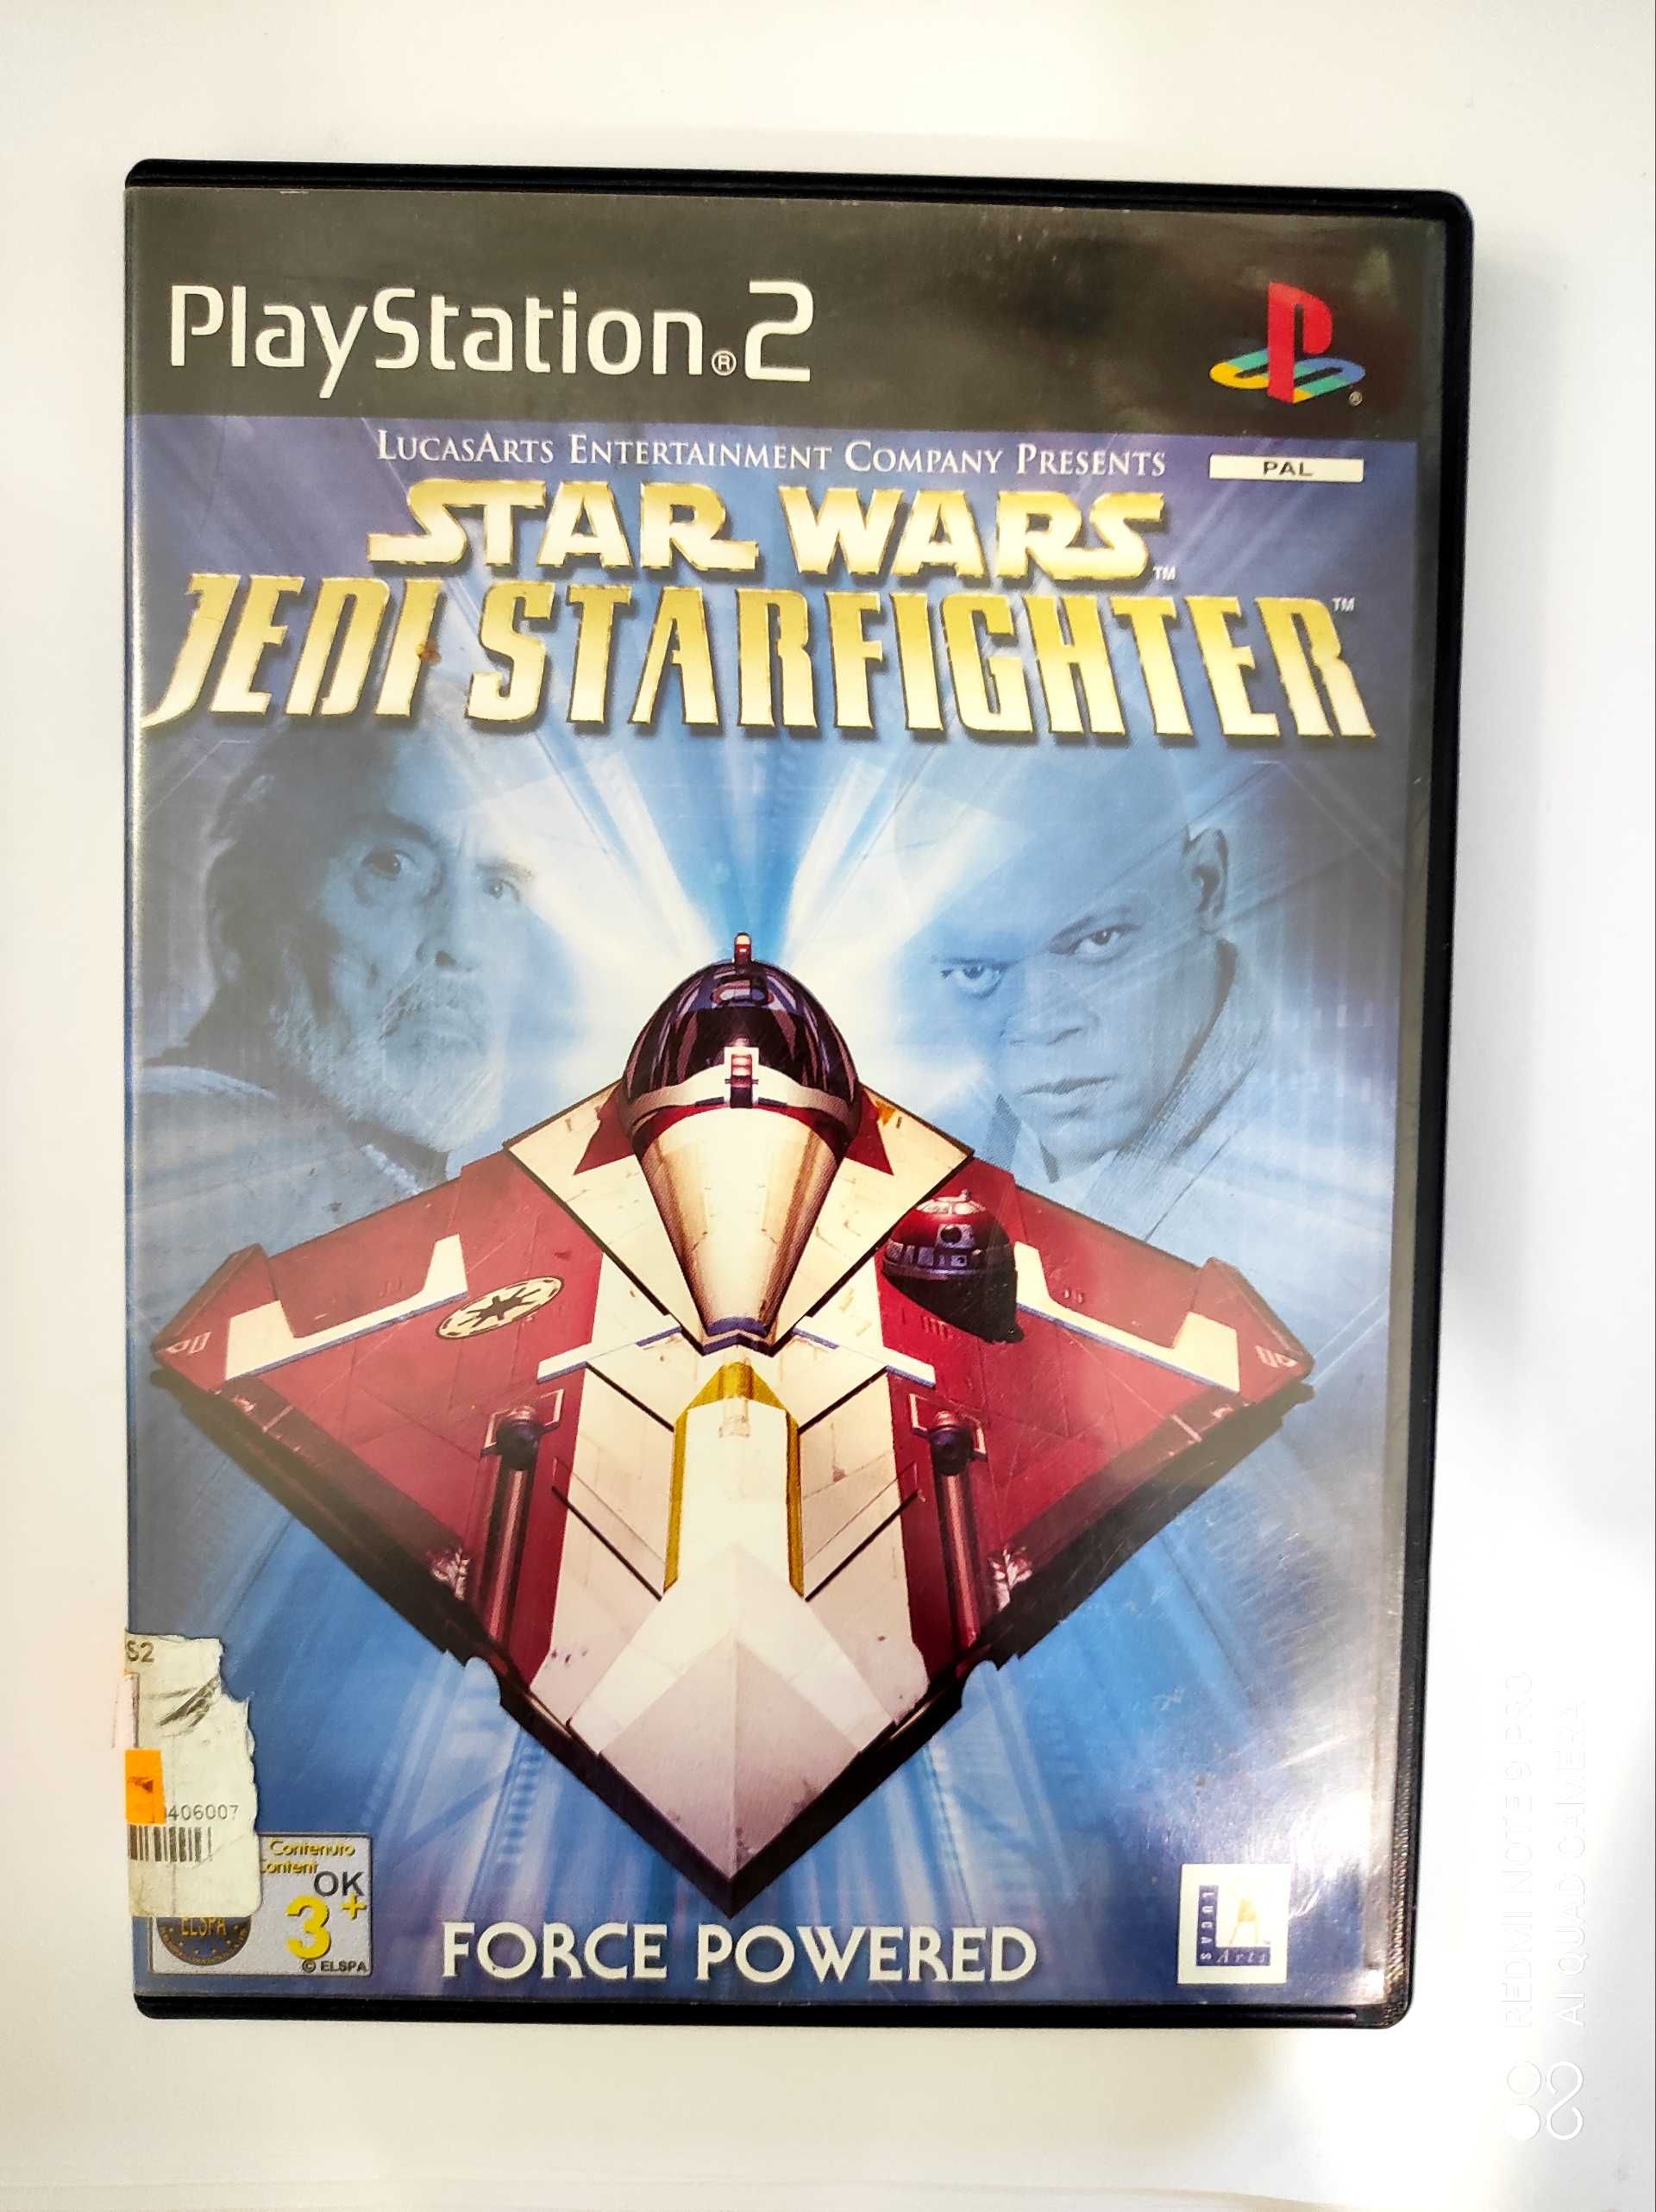 Star wars jedi Starfighter ps2